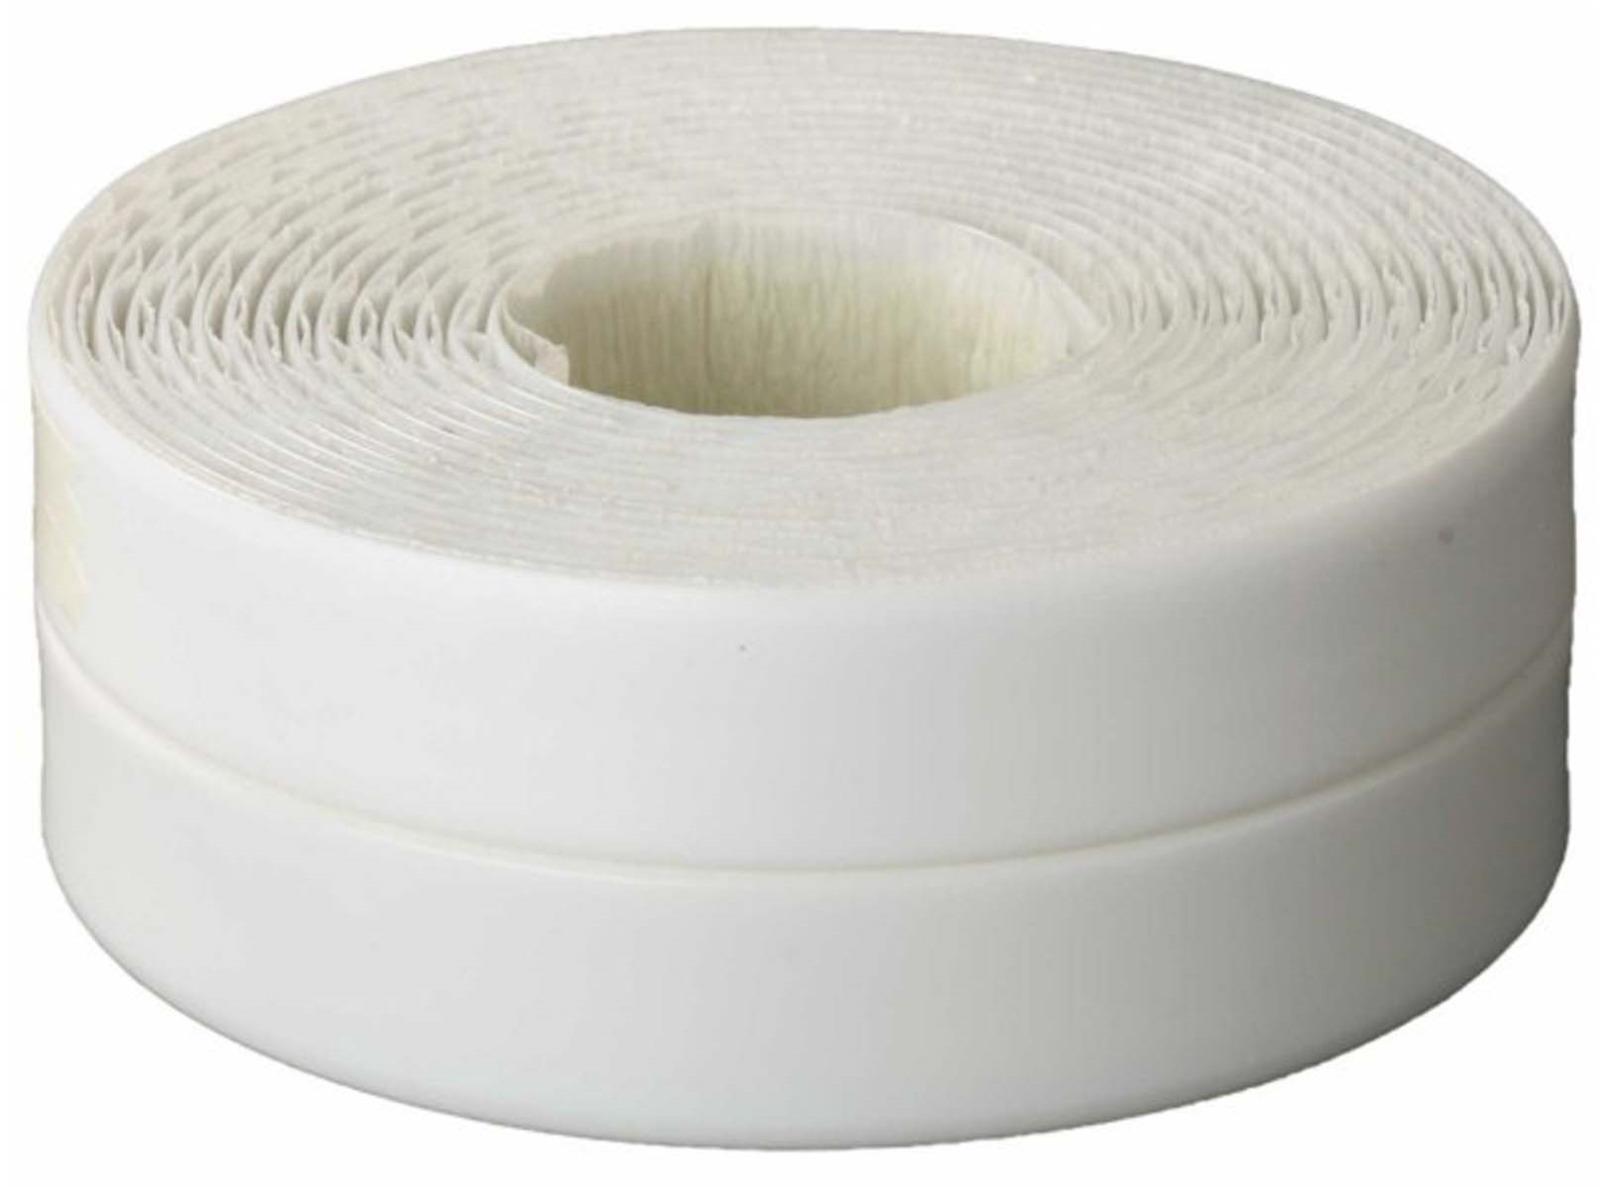 Лента бордюрная MasterProf, герметик, 40 мм, уп.3.35м, цвет: белый световозвращающая лента oralite reflexite vc104 tanker stickers для жесткого борта для цистерн белая 50 м